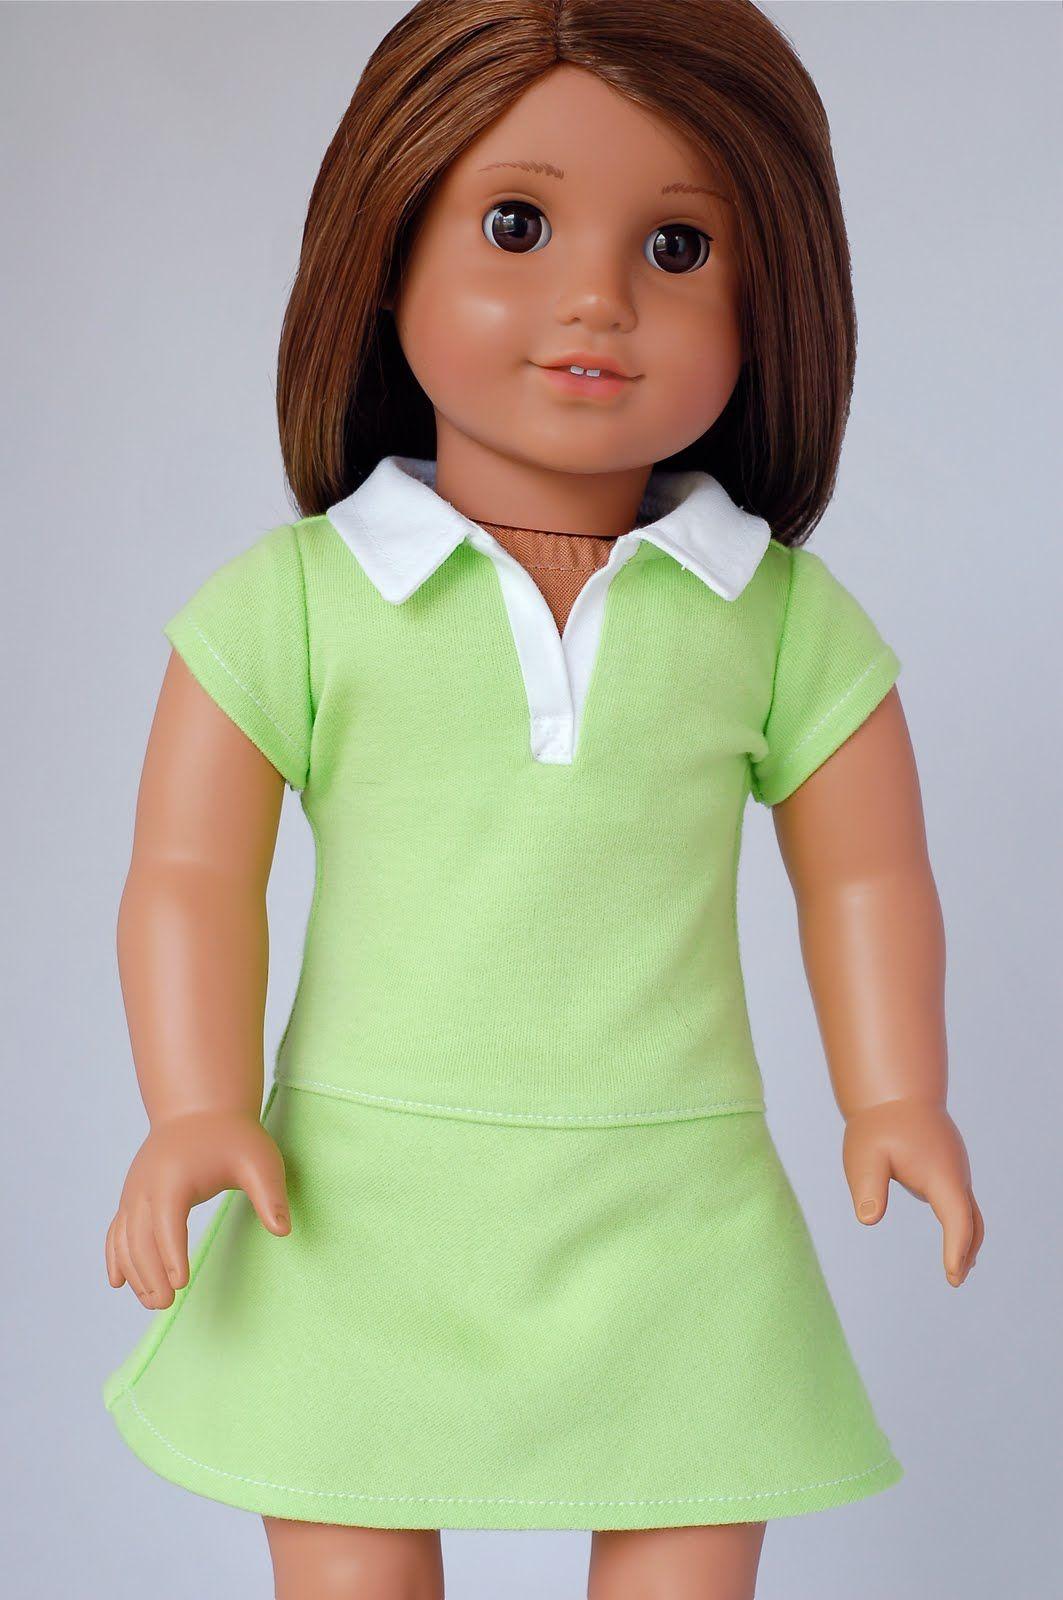 American Girl Doll Clothes Pattern: Polo Shirt Dress | Liberty Jane ...